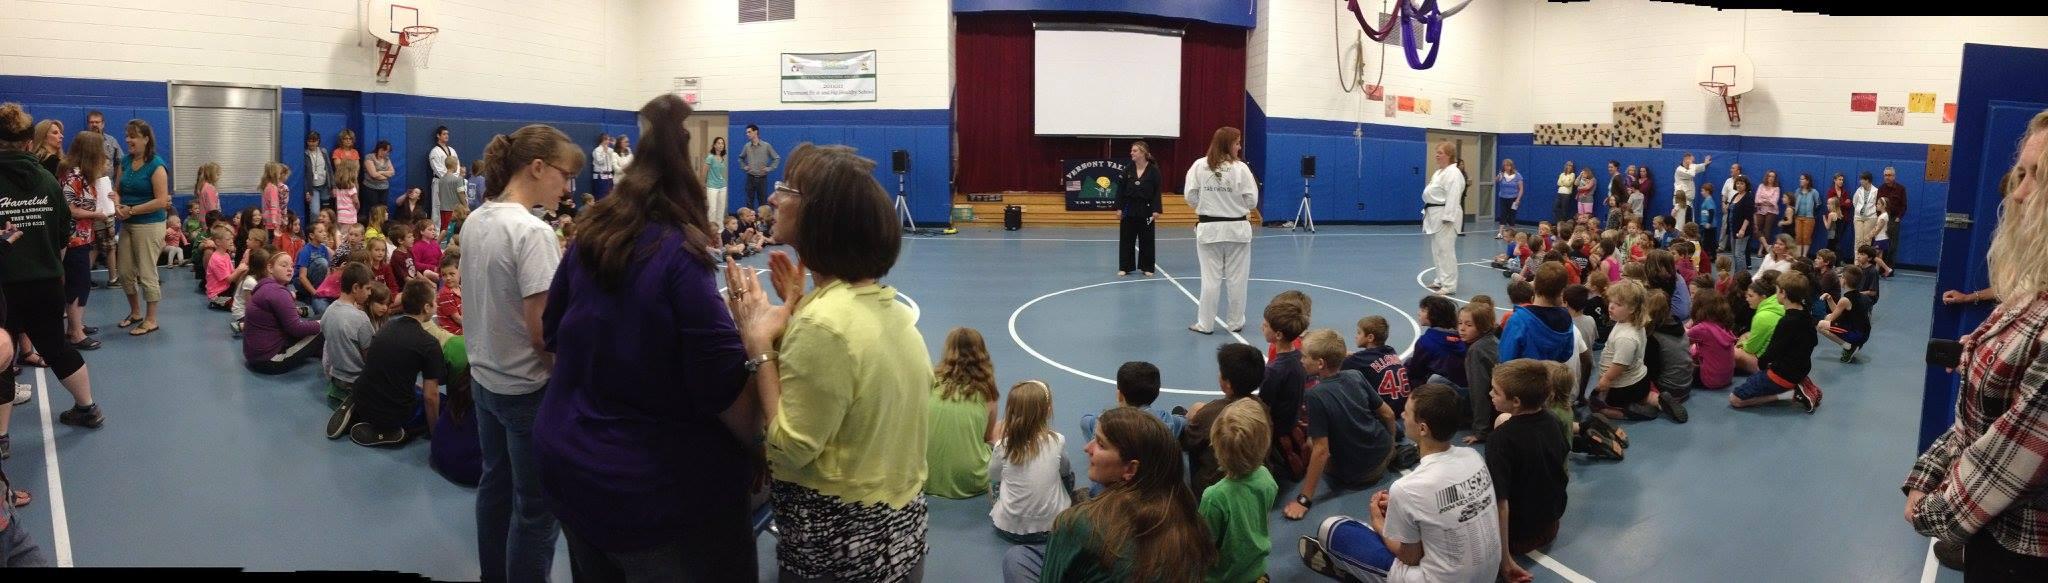 Elementary school demo